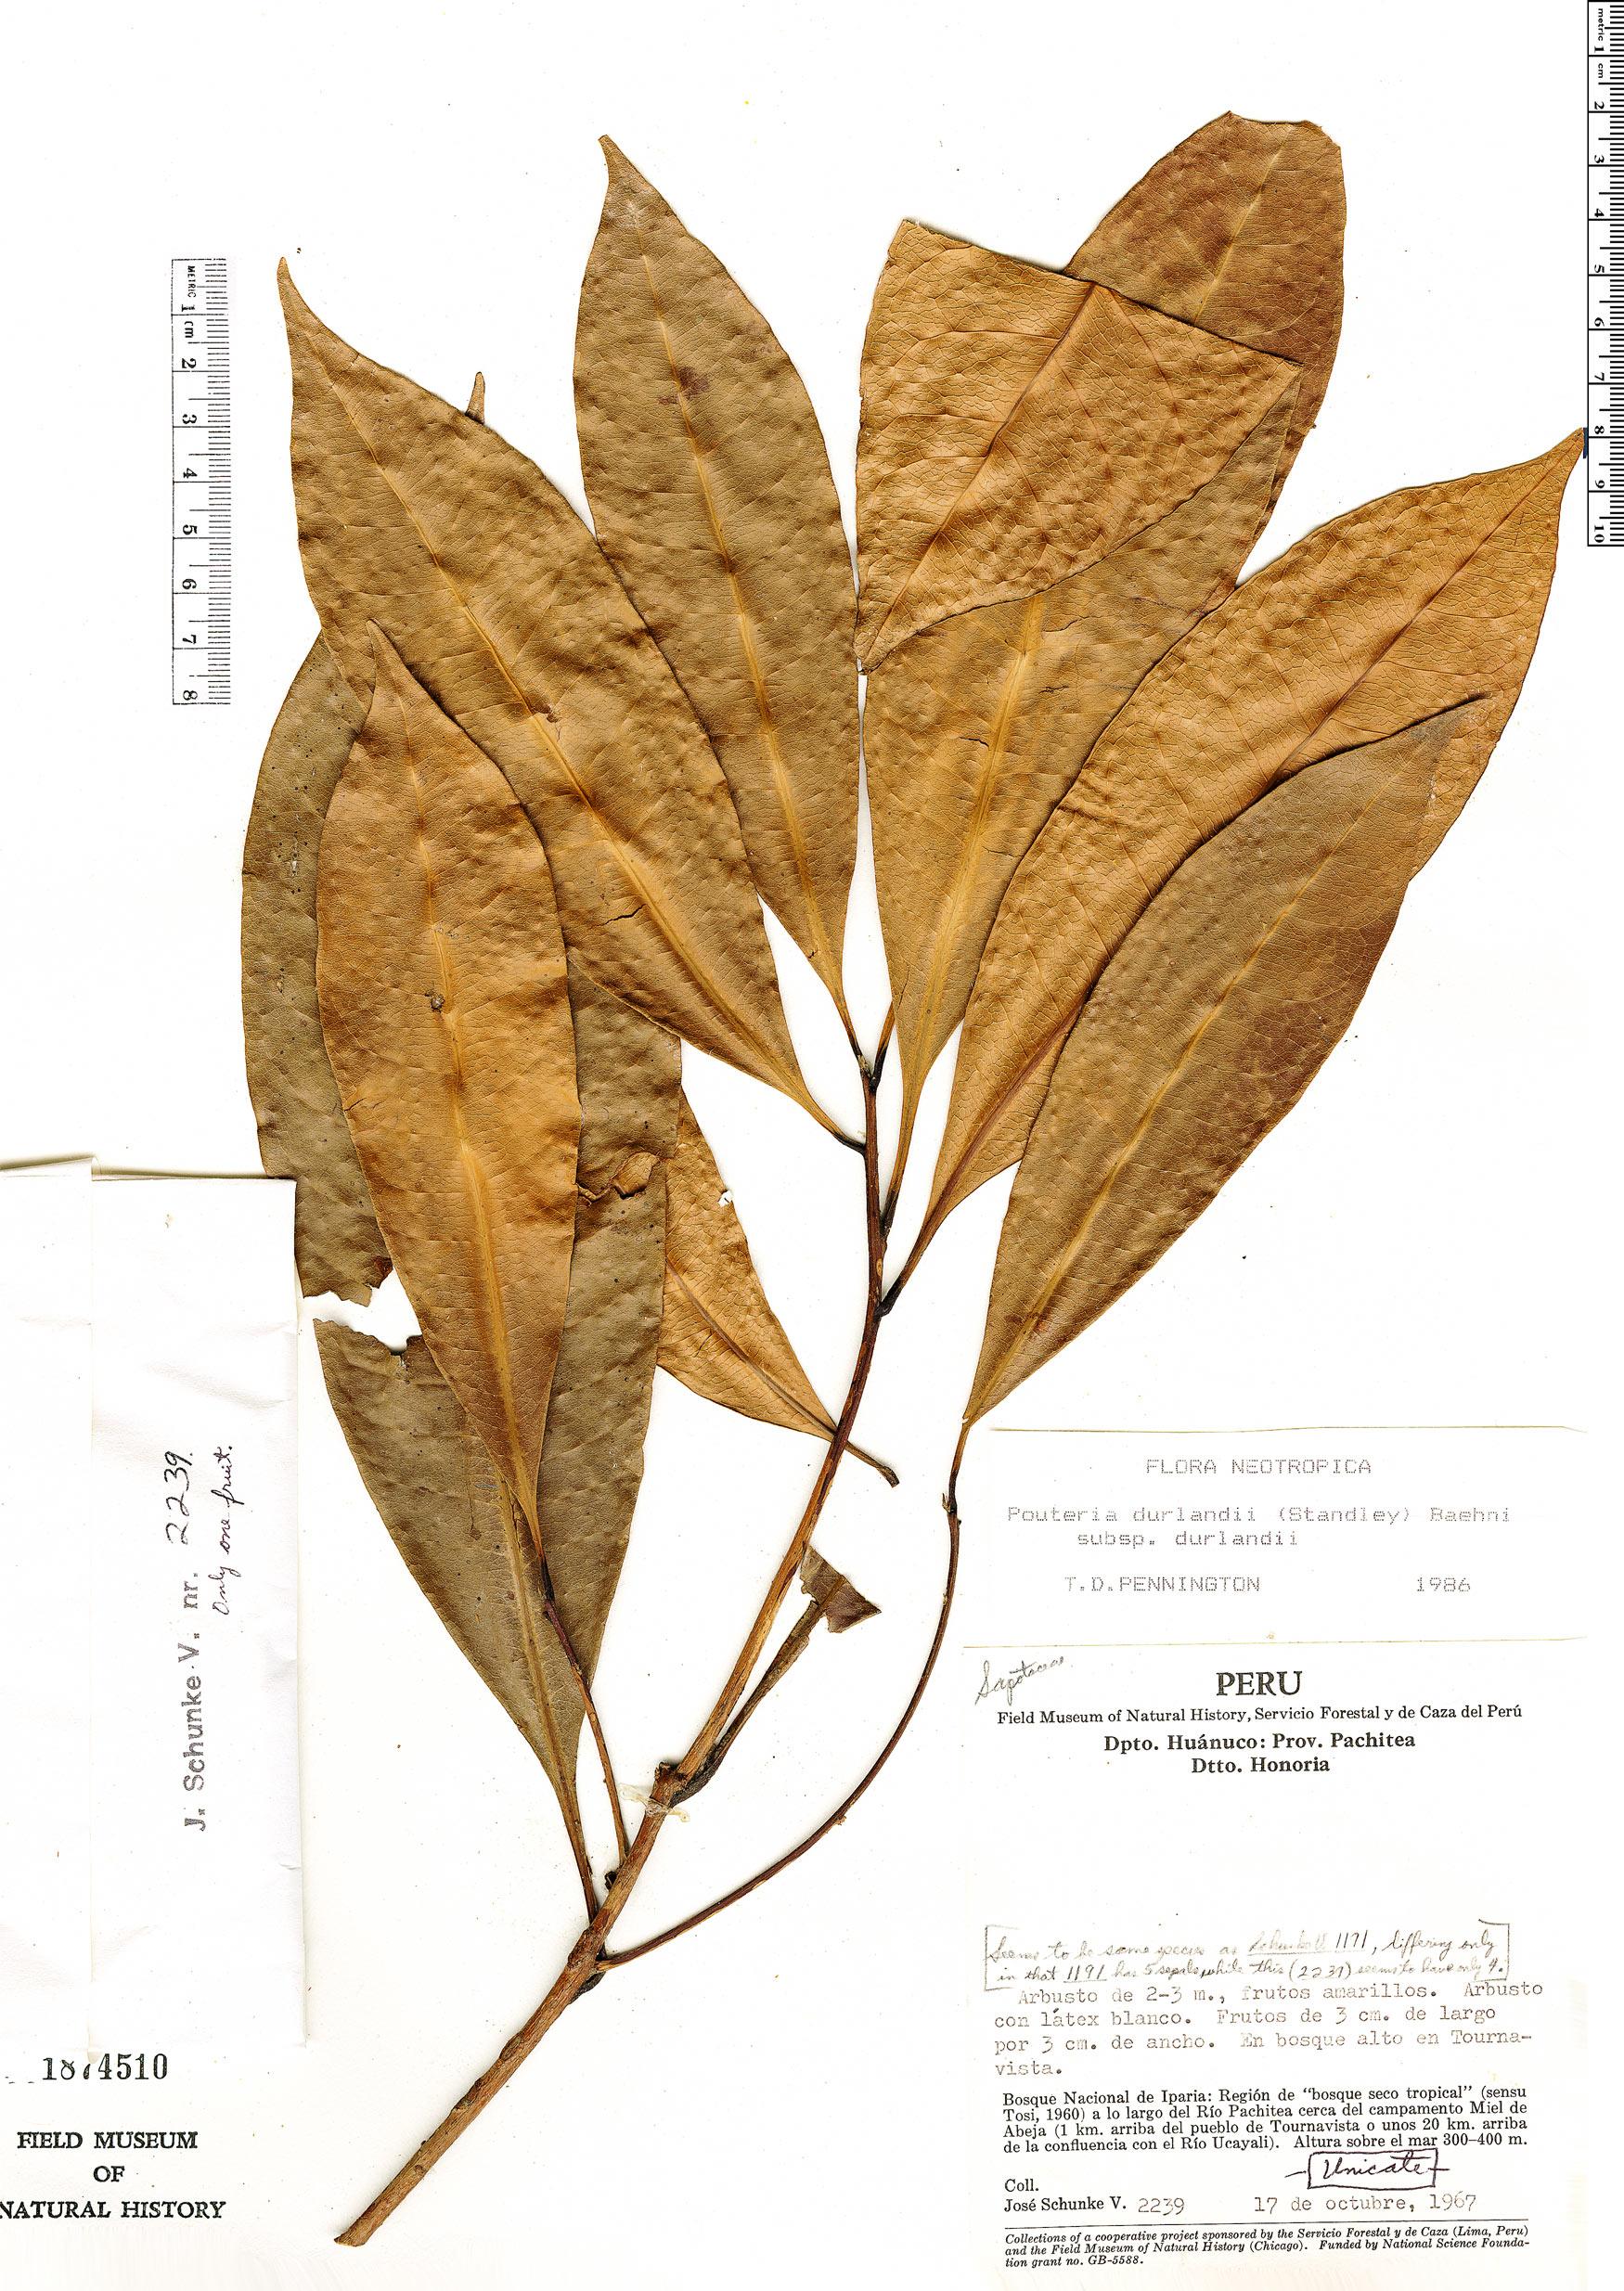 Specimen: Pouteria durlandii